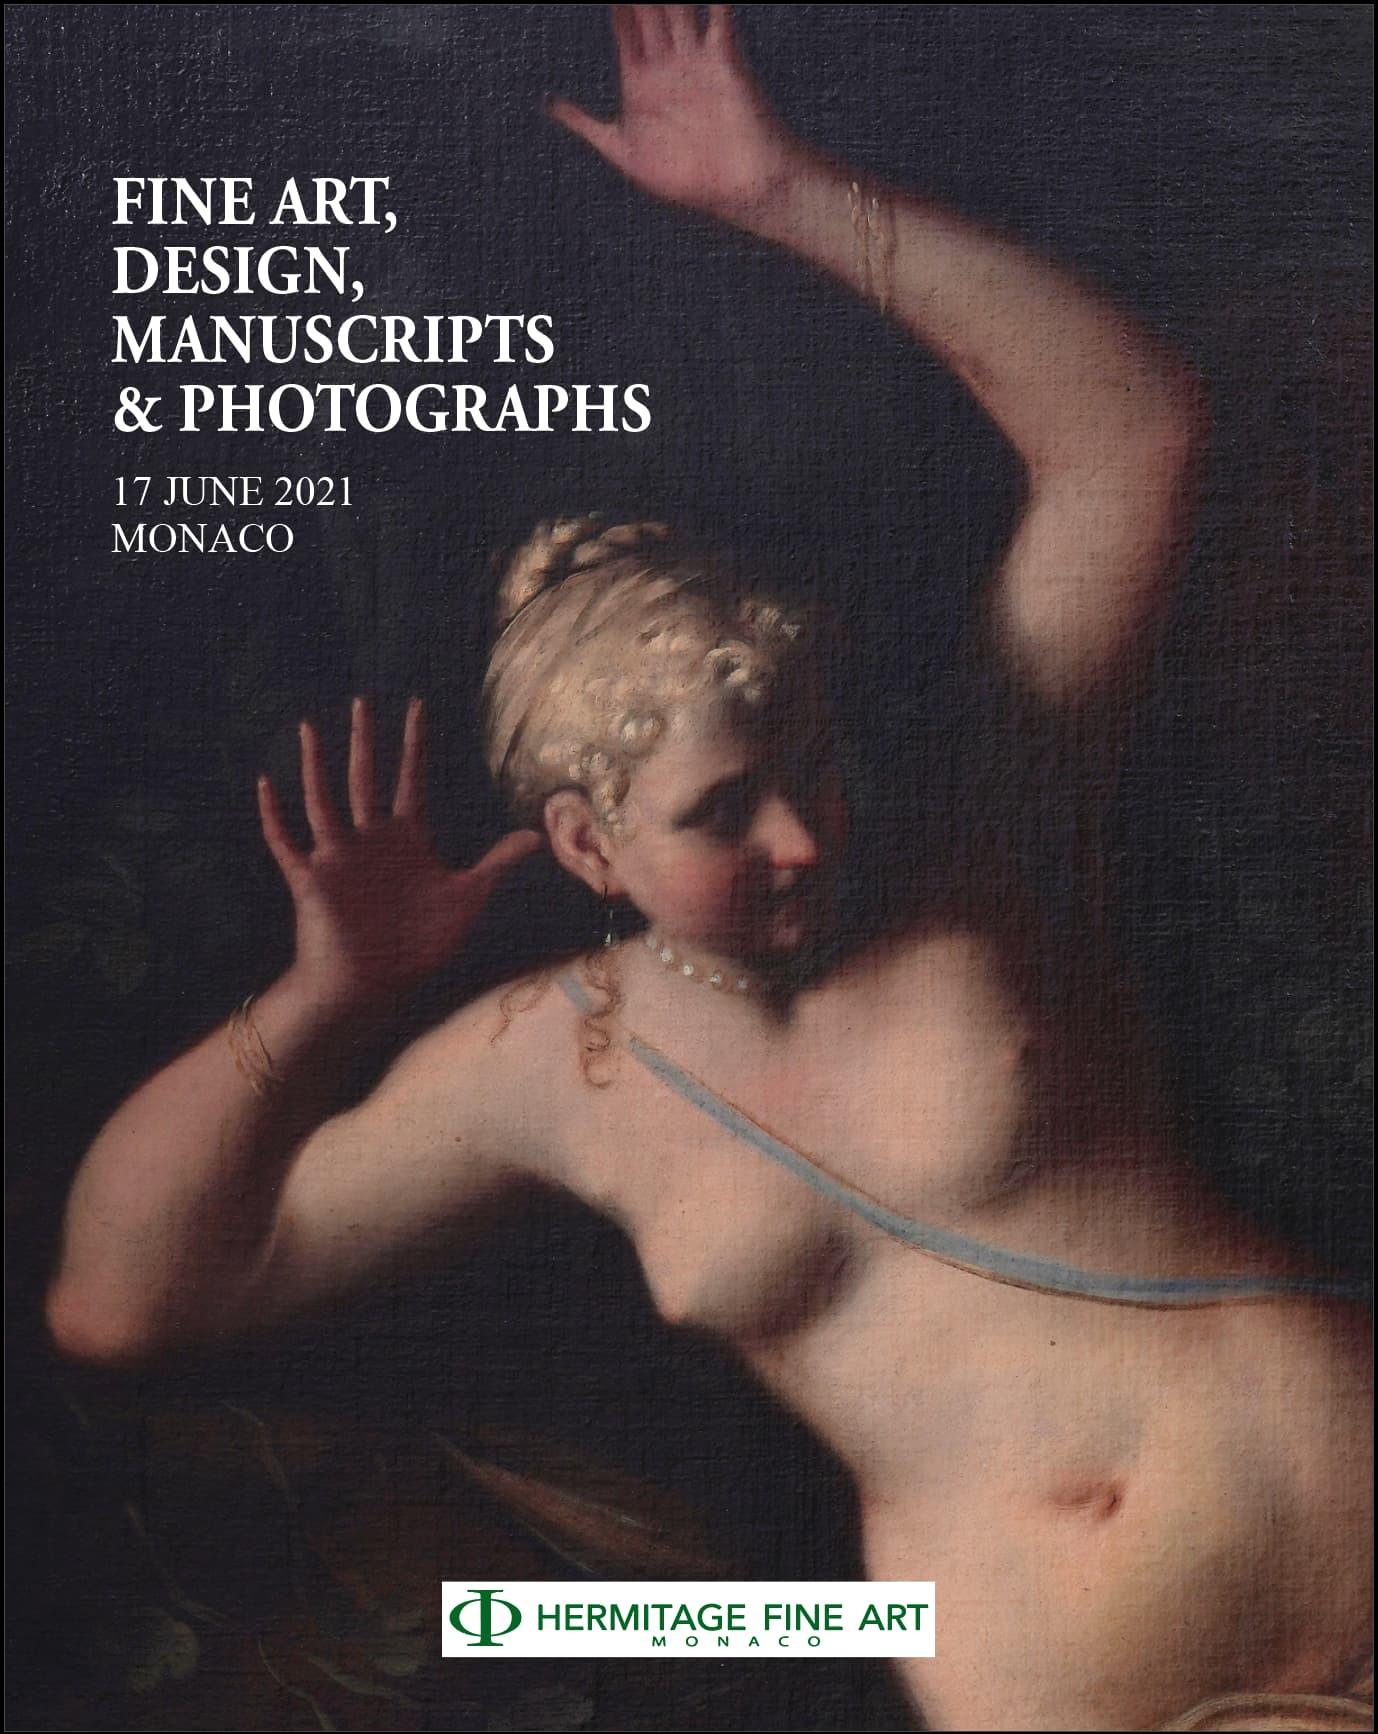 Auction Beaux-Arts, Design, Manuscrits & Photographies at Hermitage Fine Art : 306 lots